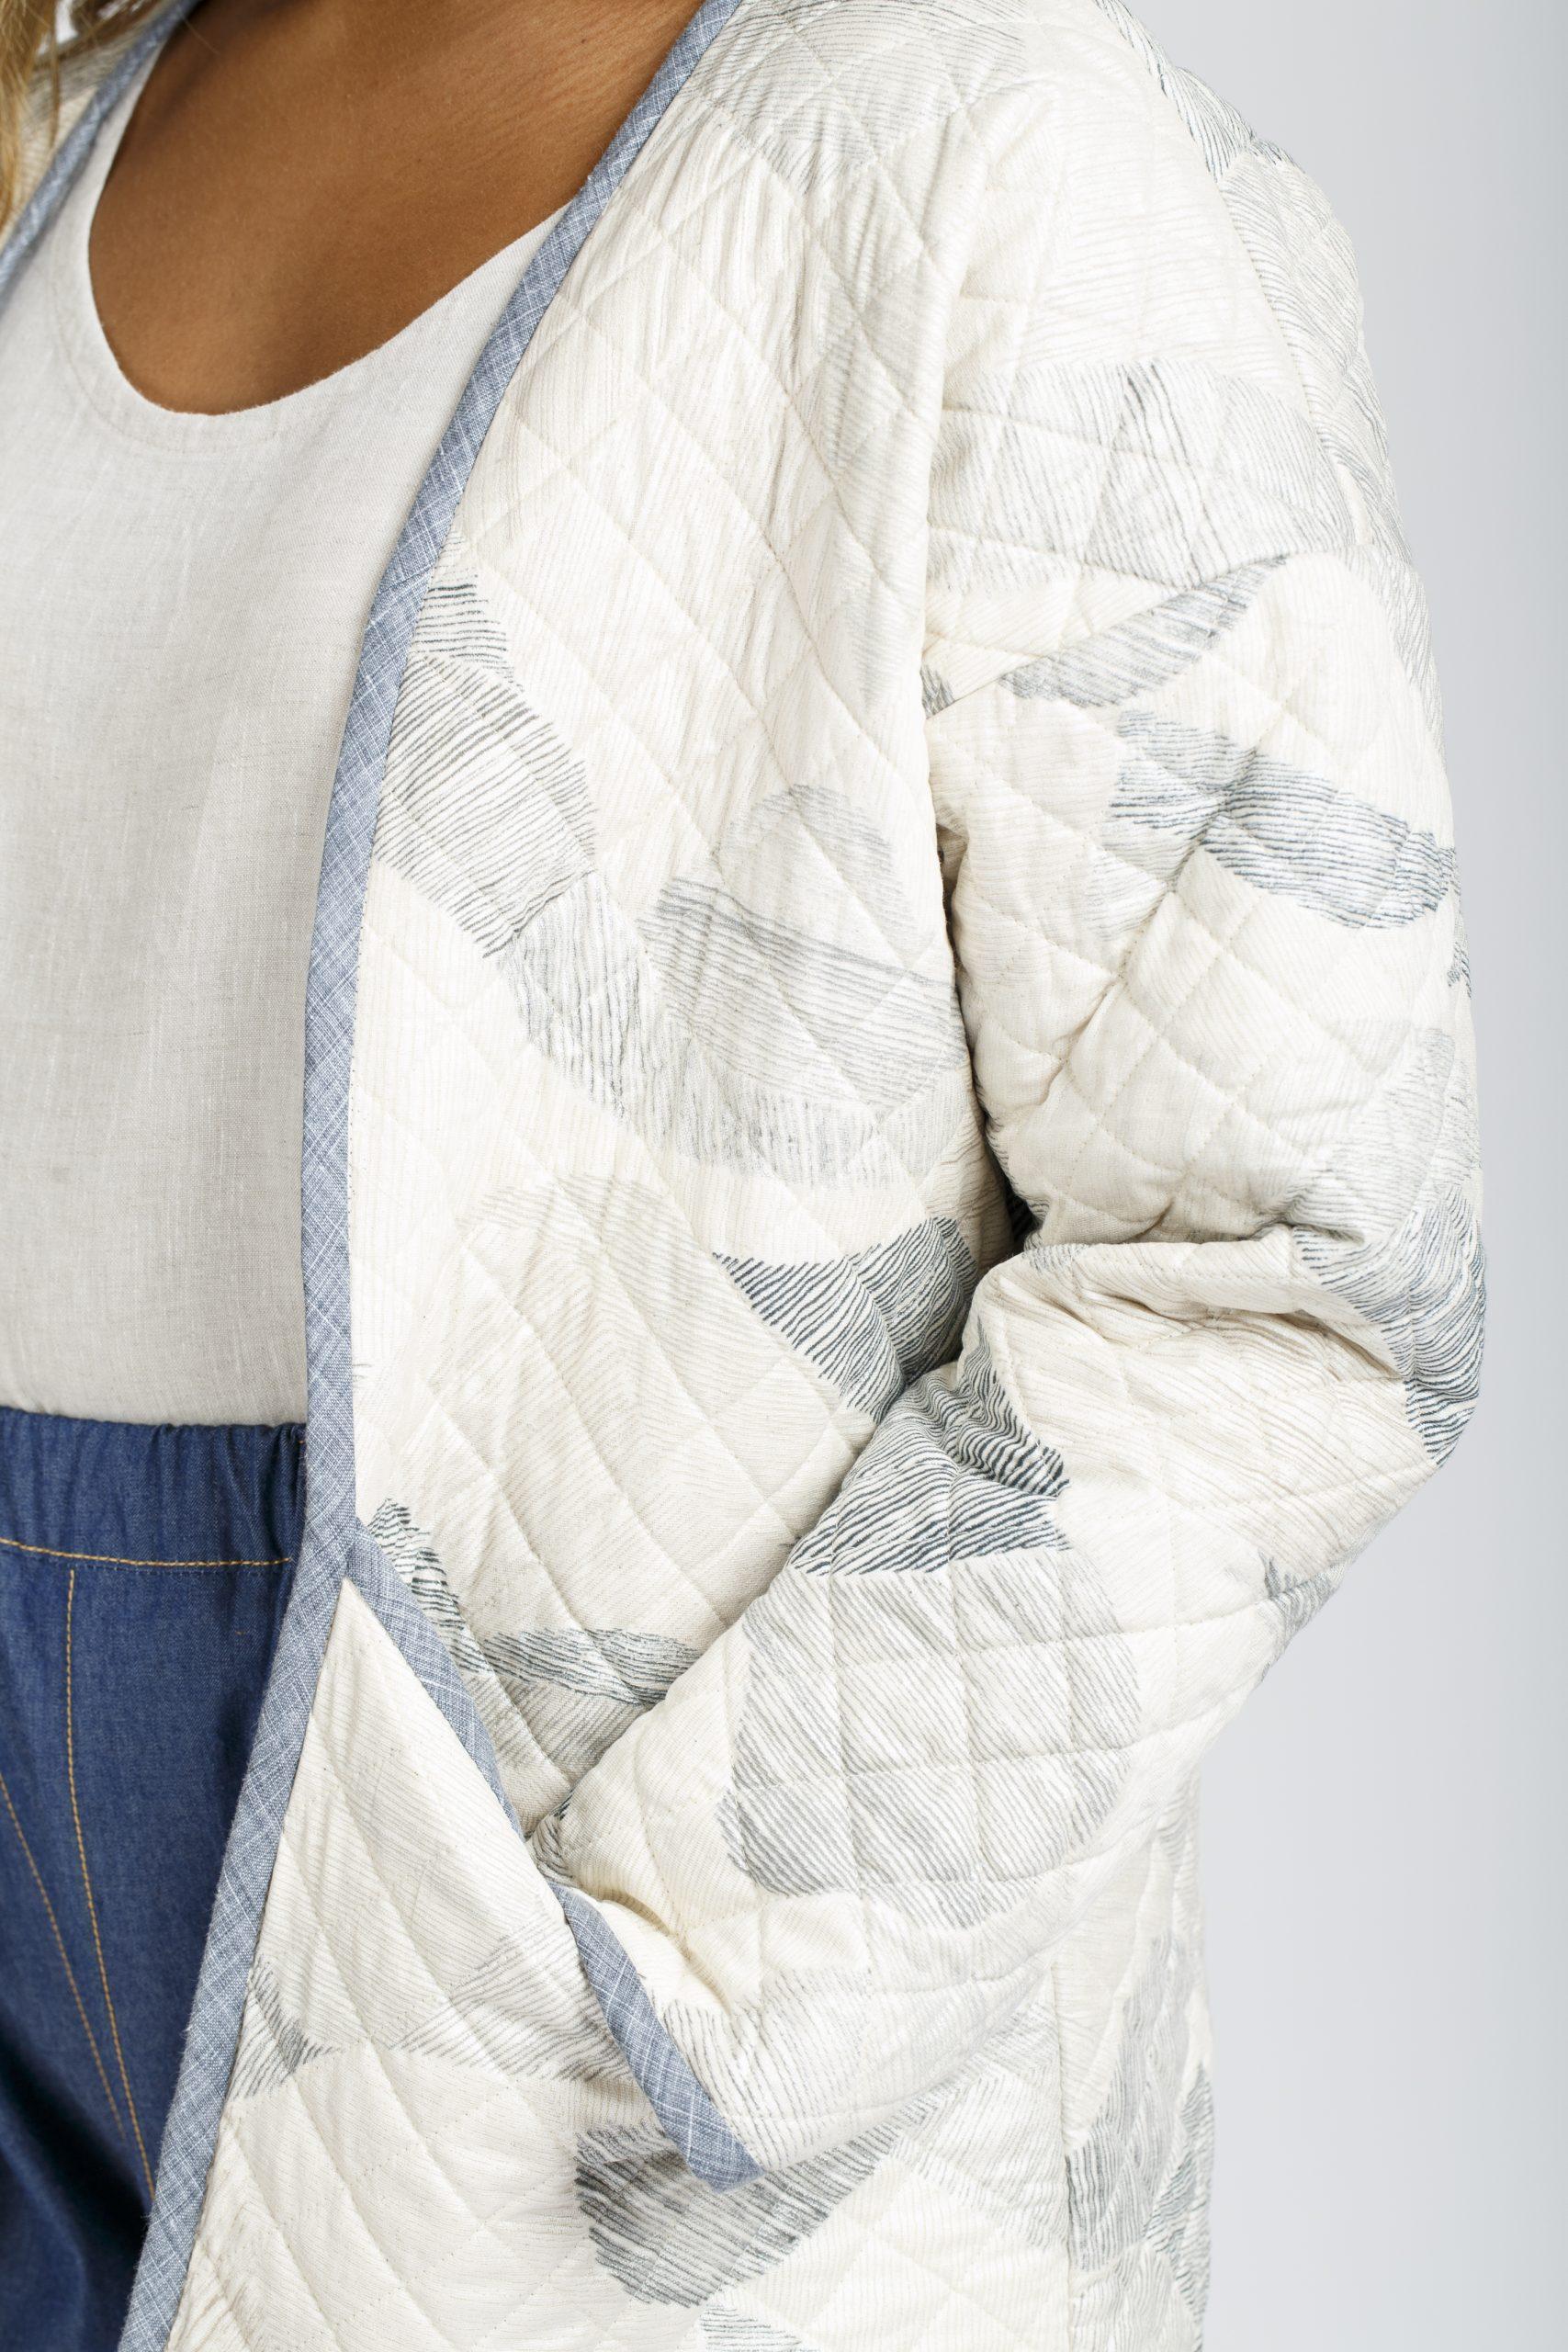 Megan Nielsen Patterns | Hovea Sewalong: Quilting Design | Straight Line Quilting Design